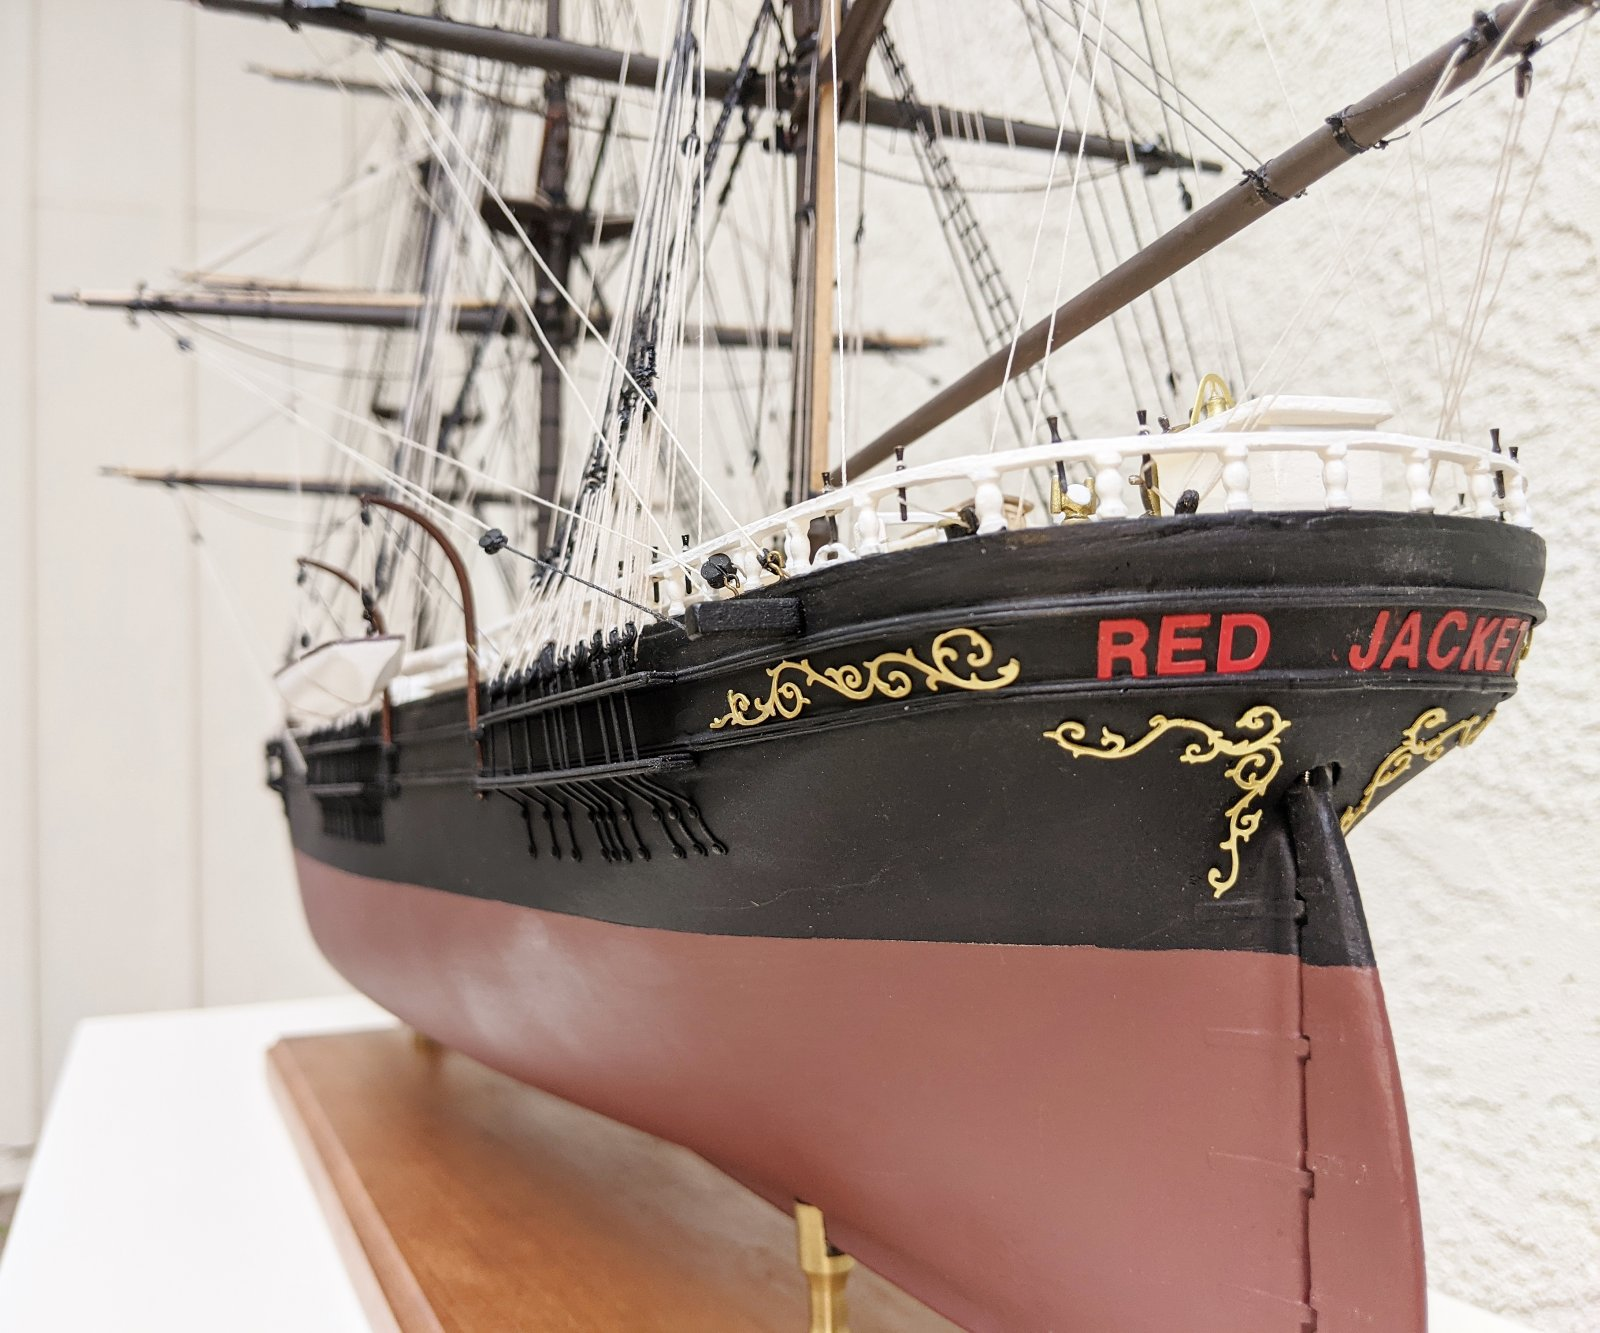 Red Jacket by JD Amdon